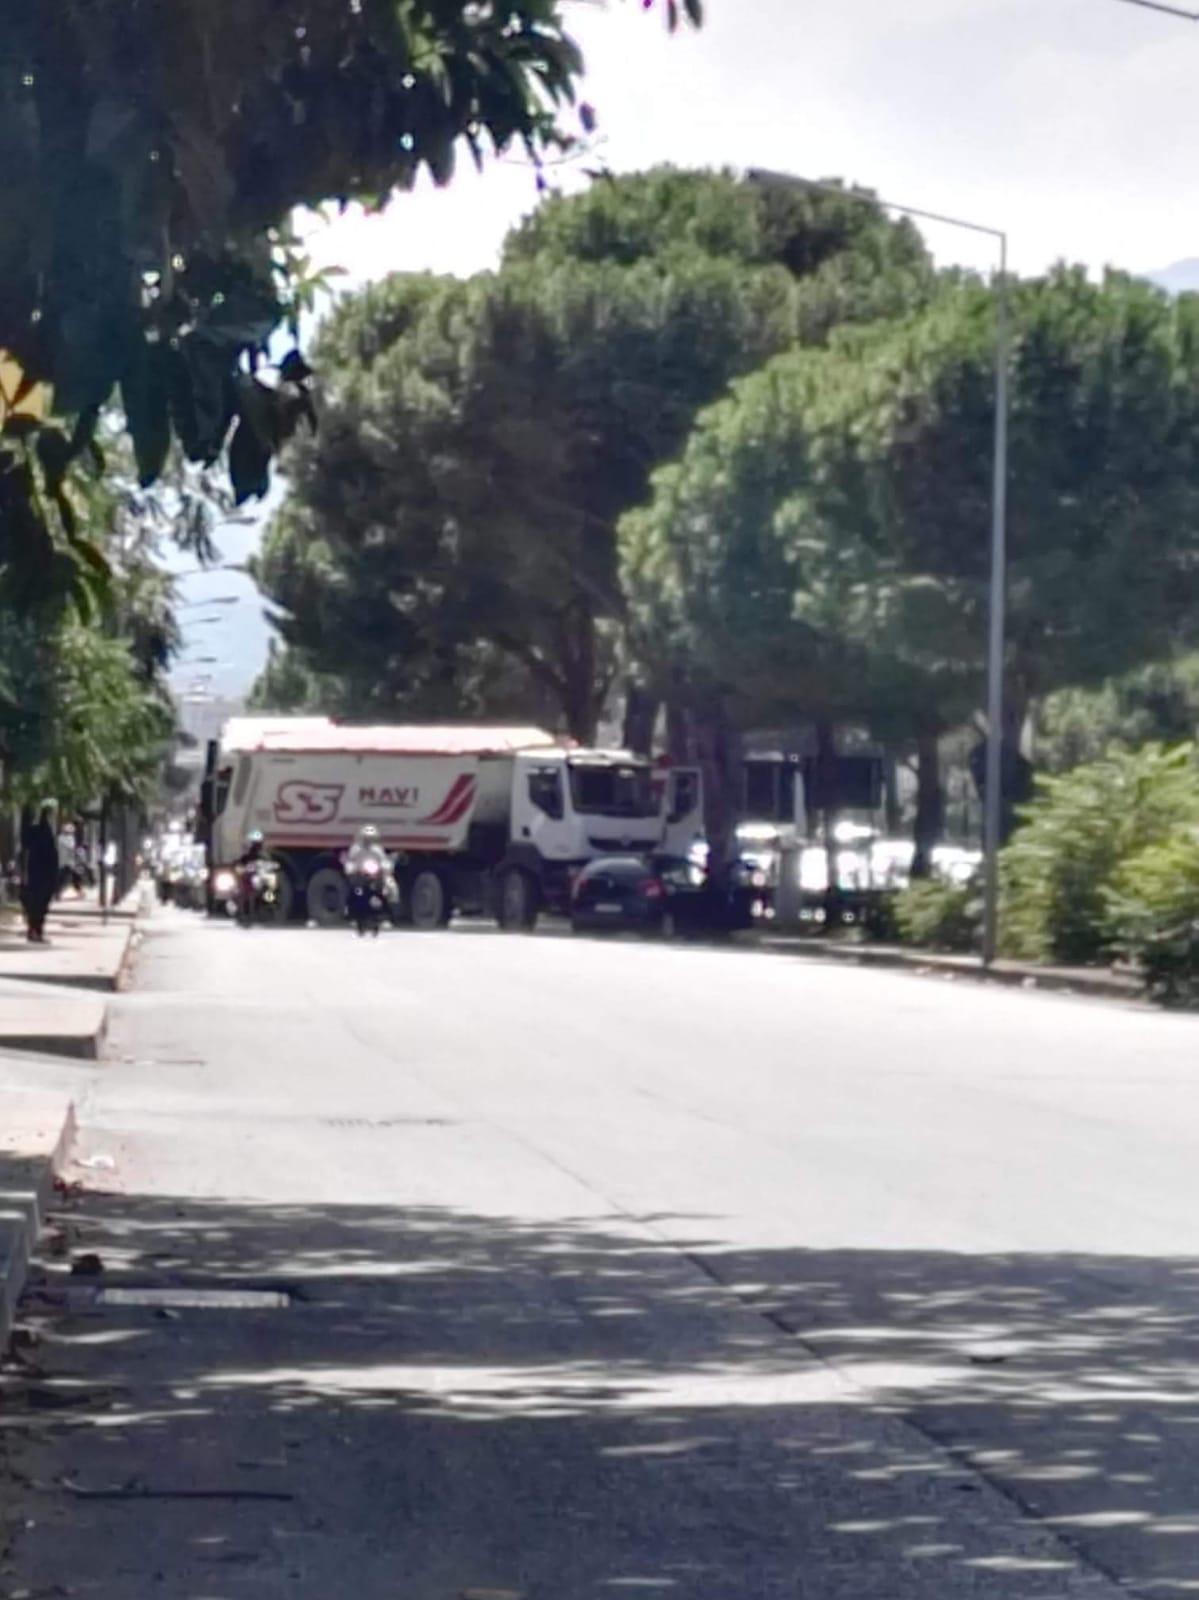 Incidente in viale Regione a Palermo a86d8f5ed0a1